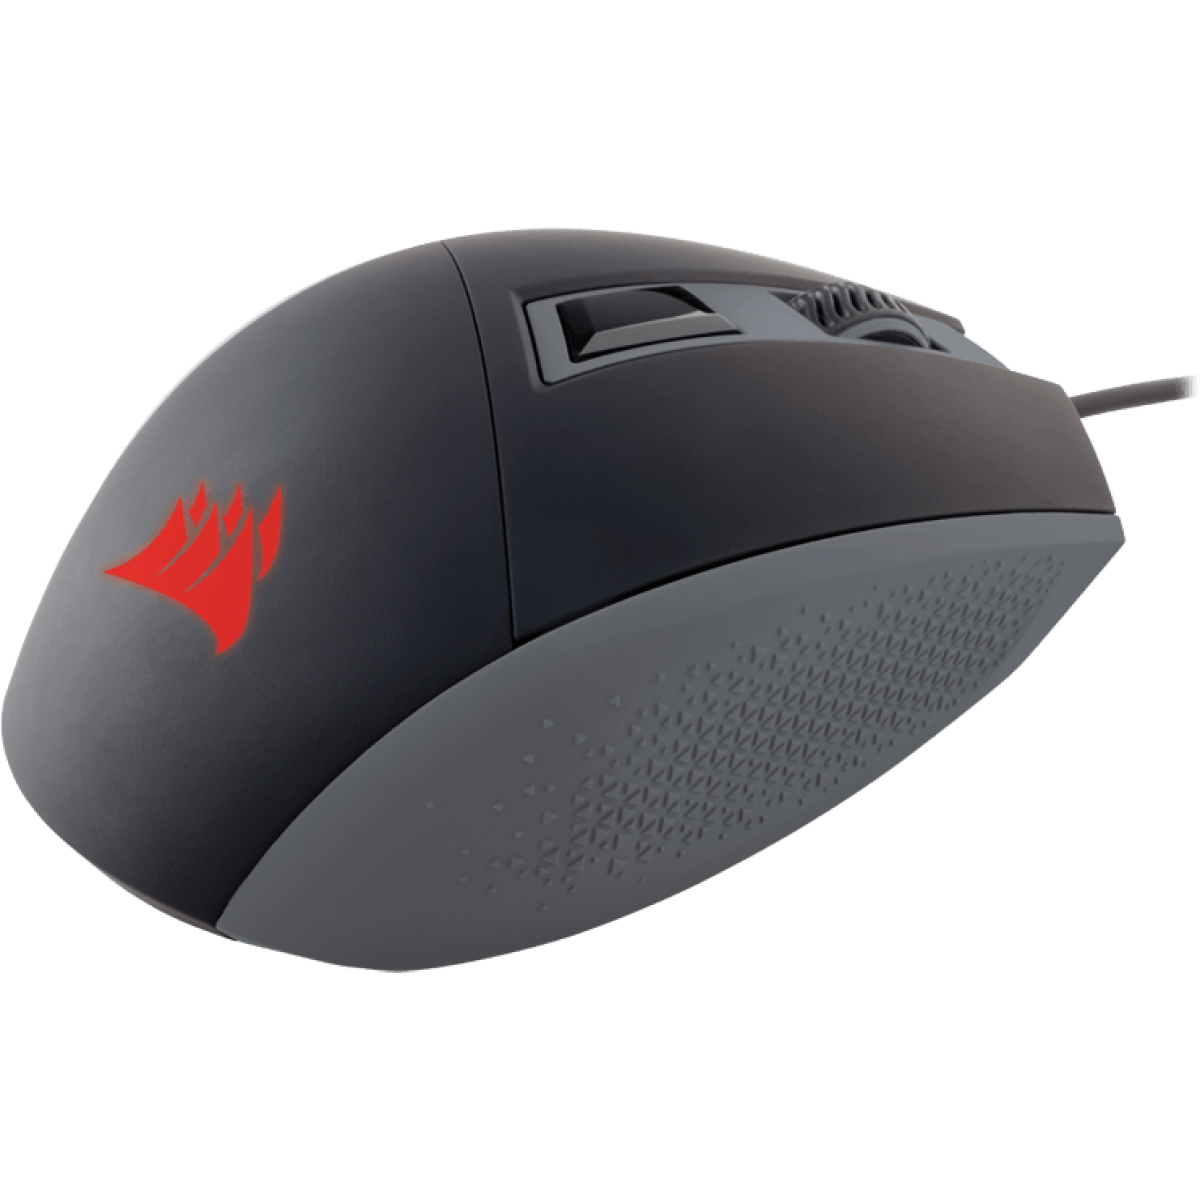 Mouse Corsair Gamer Katar Blacklit CH-9000095-NA 4 BOTÕES 8000 DPI Vermelho